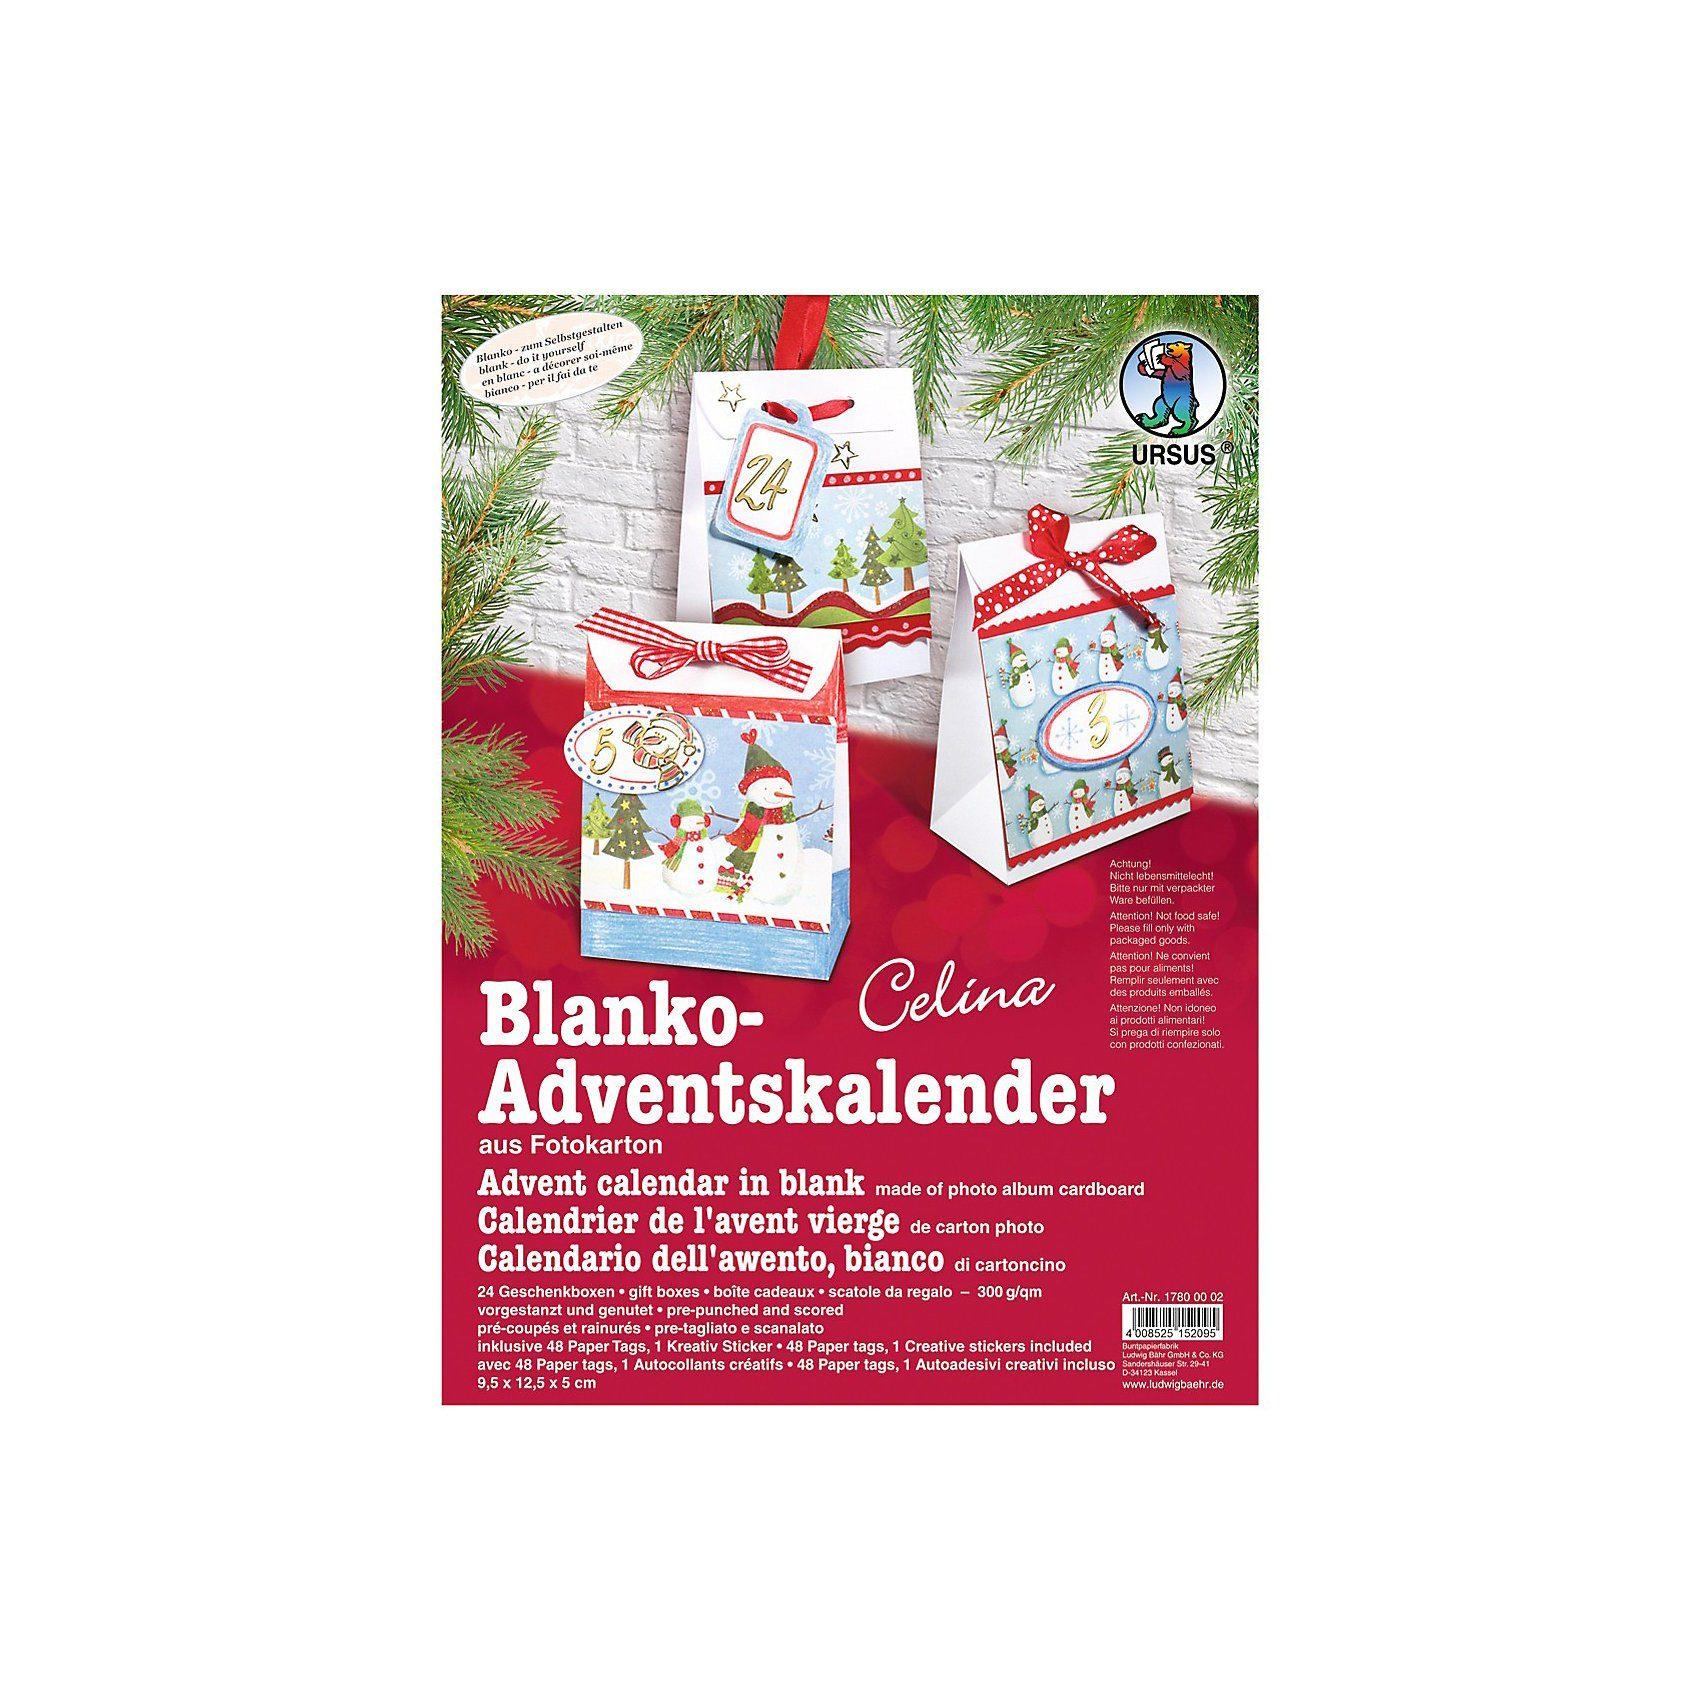 URSUS Blanko-Adventskalender Celine